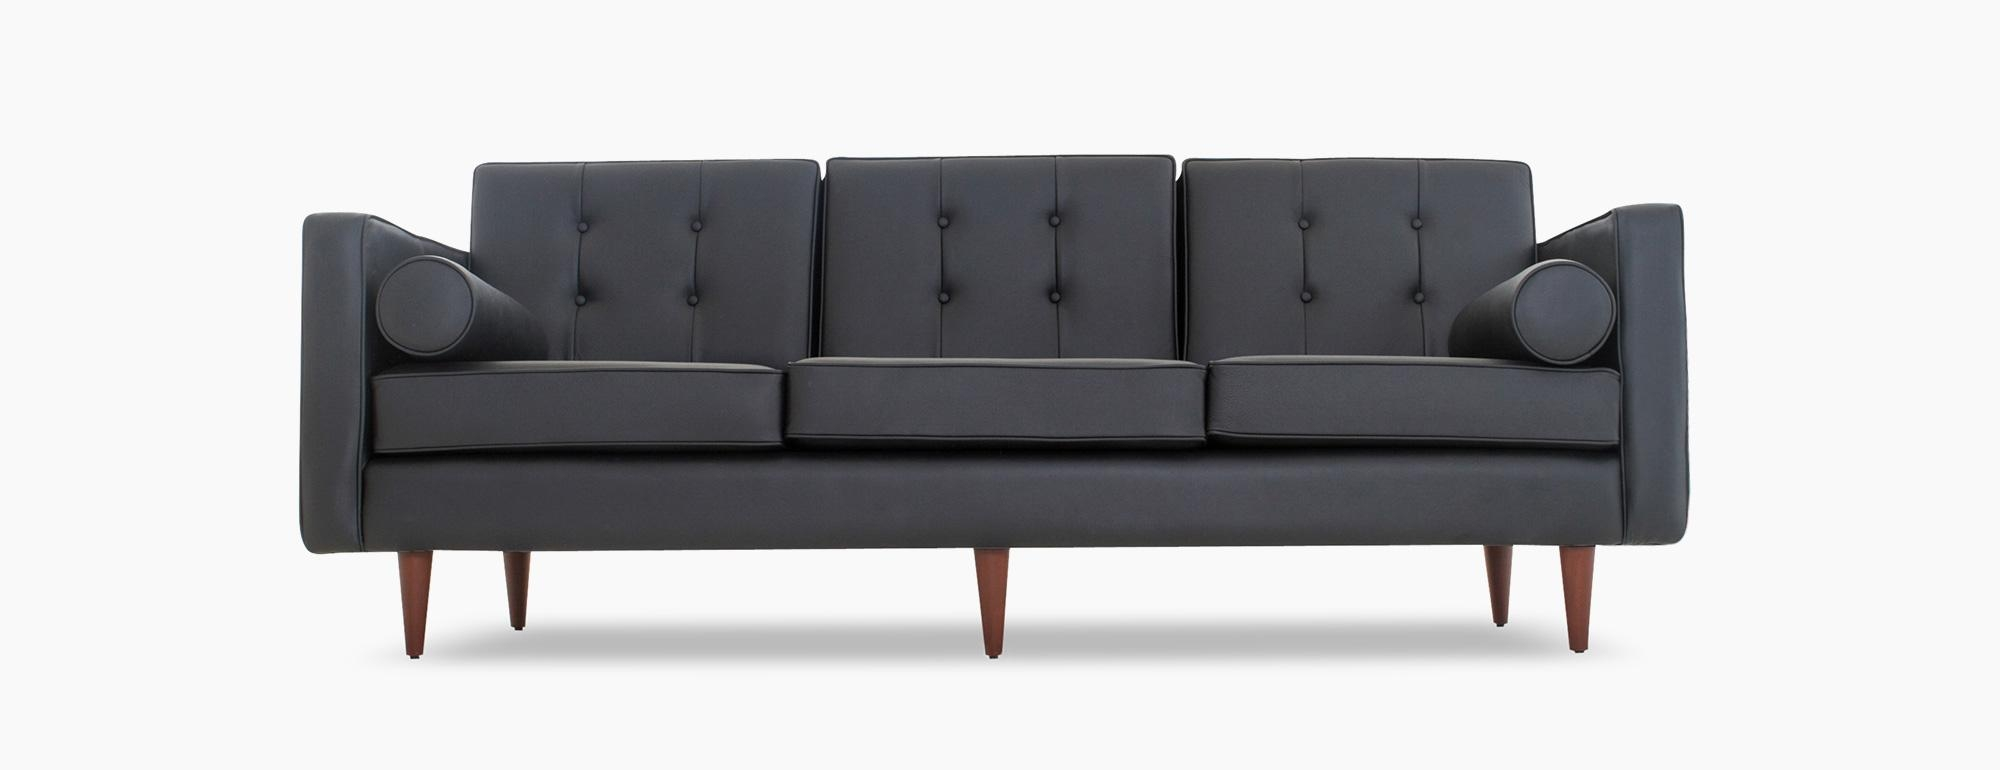 Braxton Leather Sofa | Joybird Regarding Braxton Sofas (Image 7 of 20)